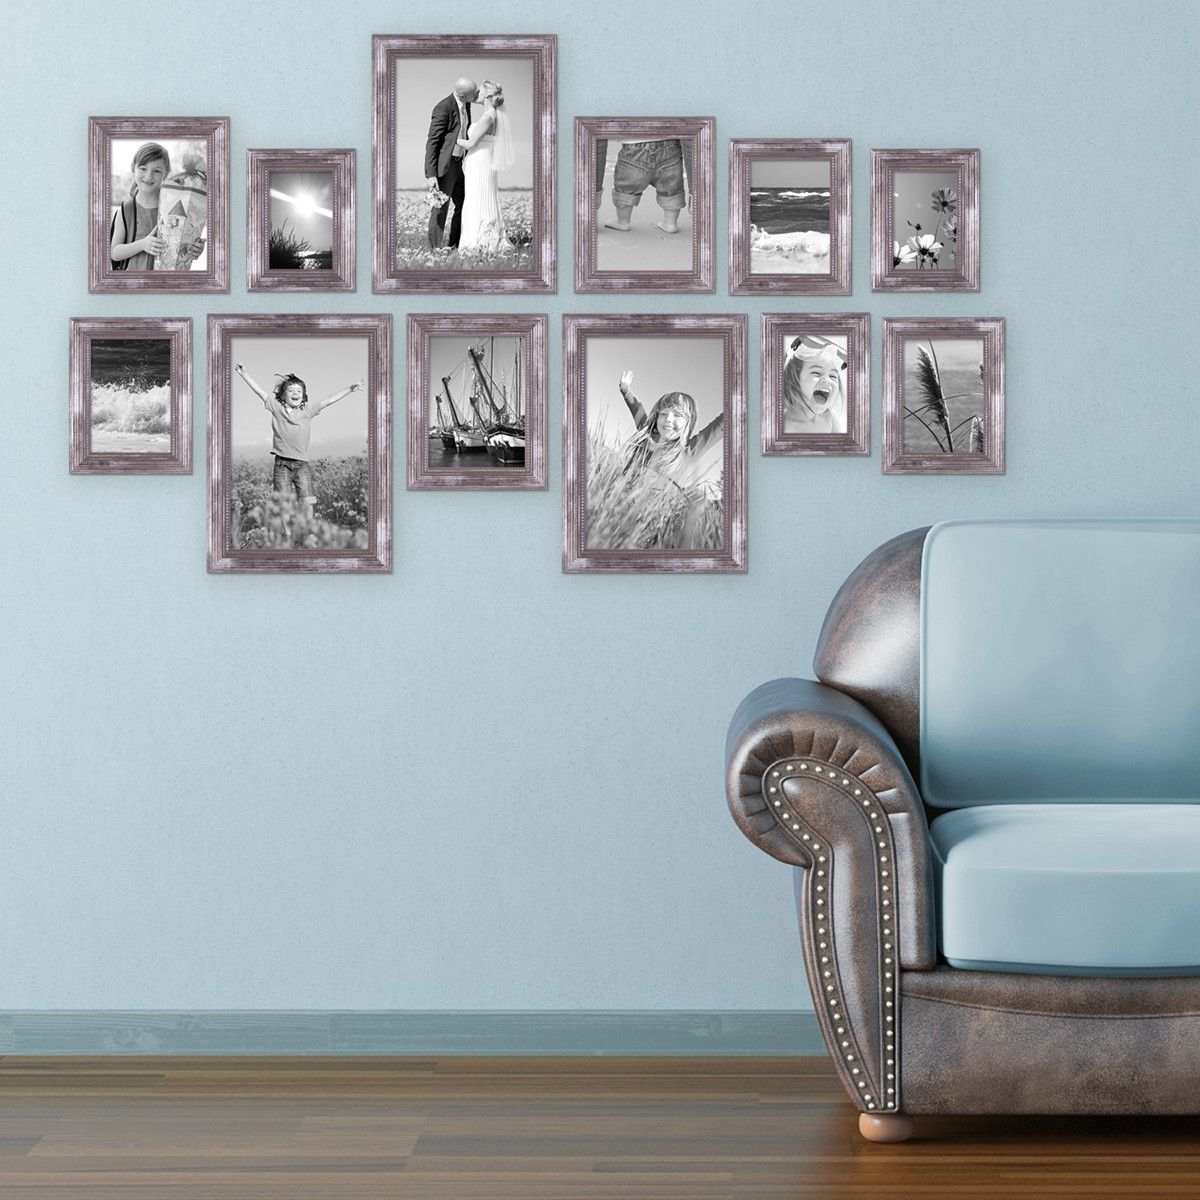 bilderrahmen 13x18 silber bilderrahmen silber 13x18. Black Bedroom Furniture Sets. Home Design Ideas